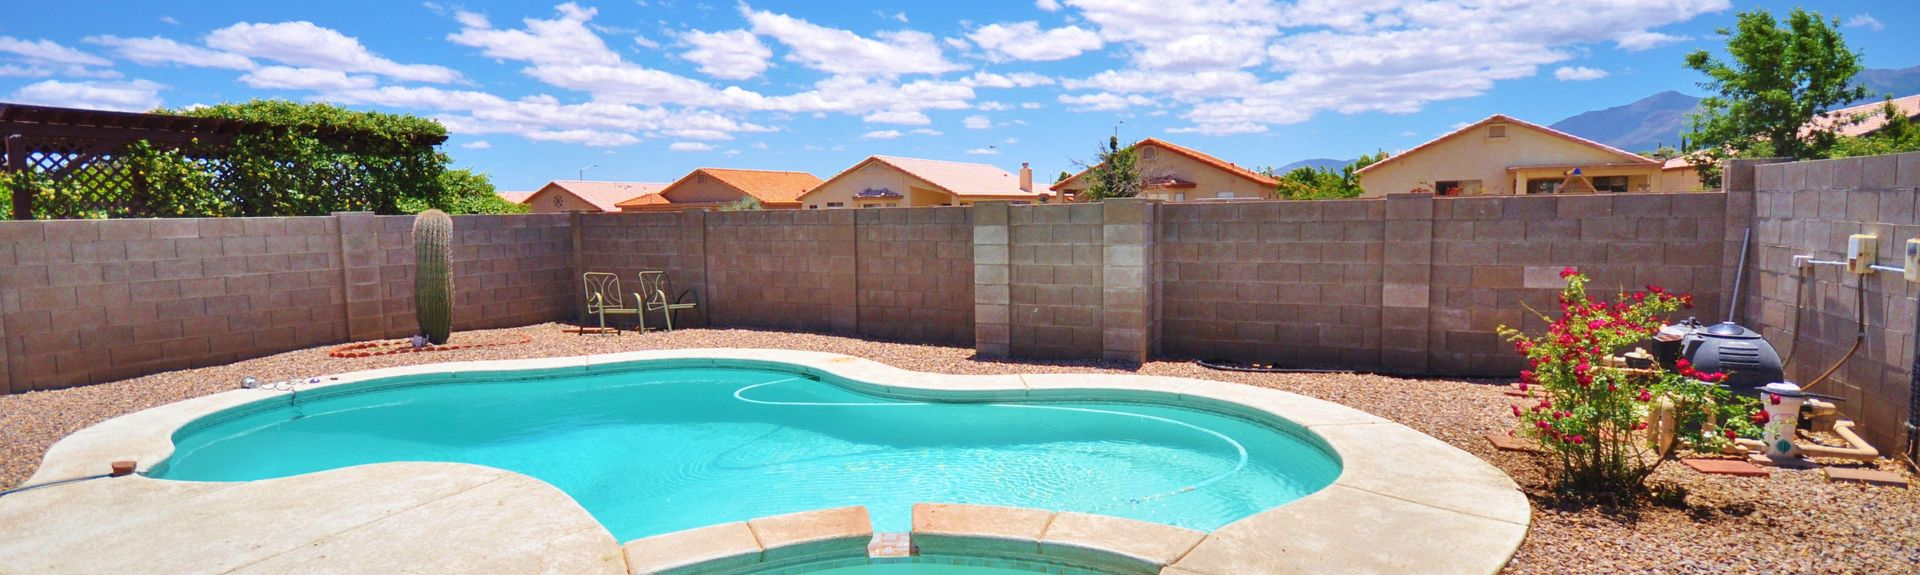 Cochise County, Arizona, United States of America